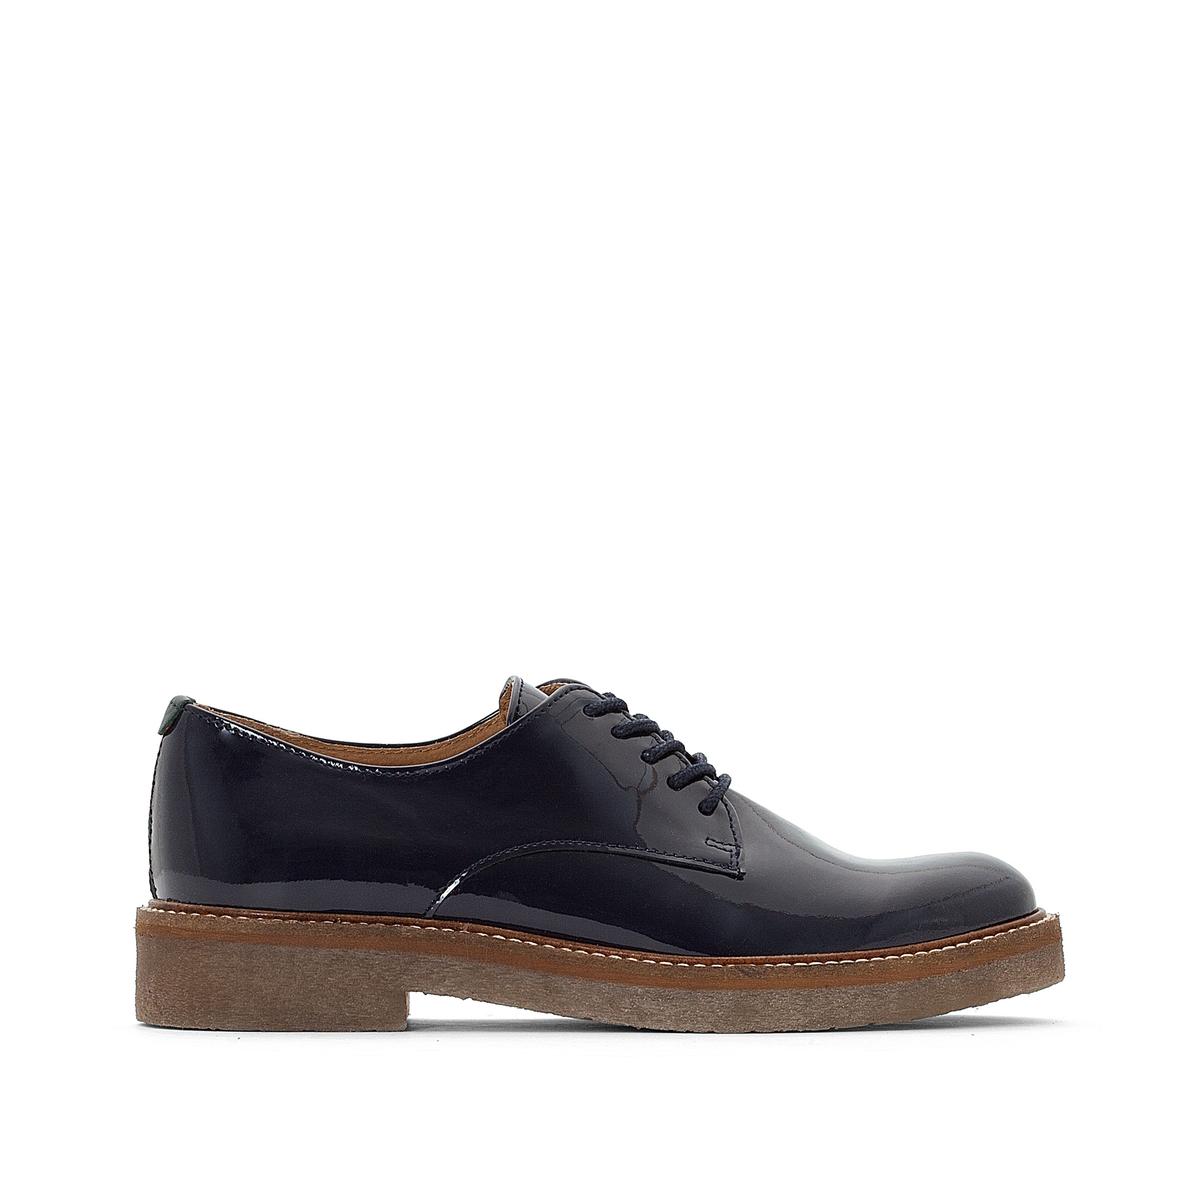 Ботинки-дерби кожаные Oxfork цены онлайн